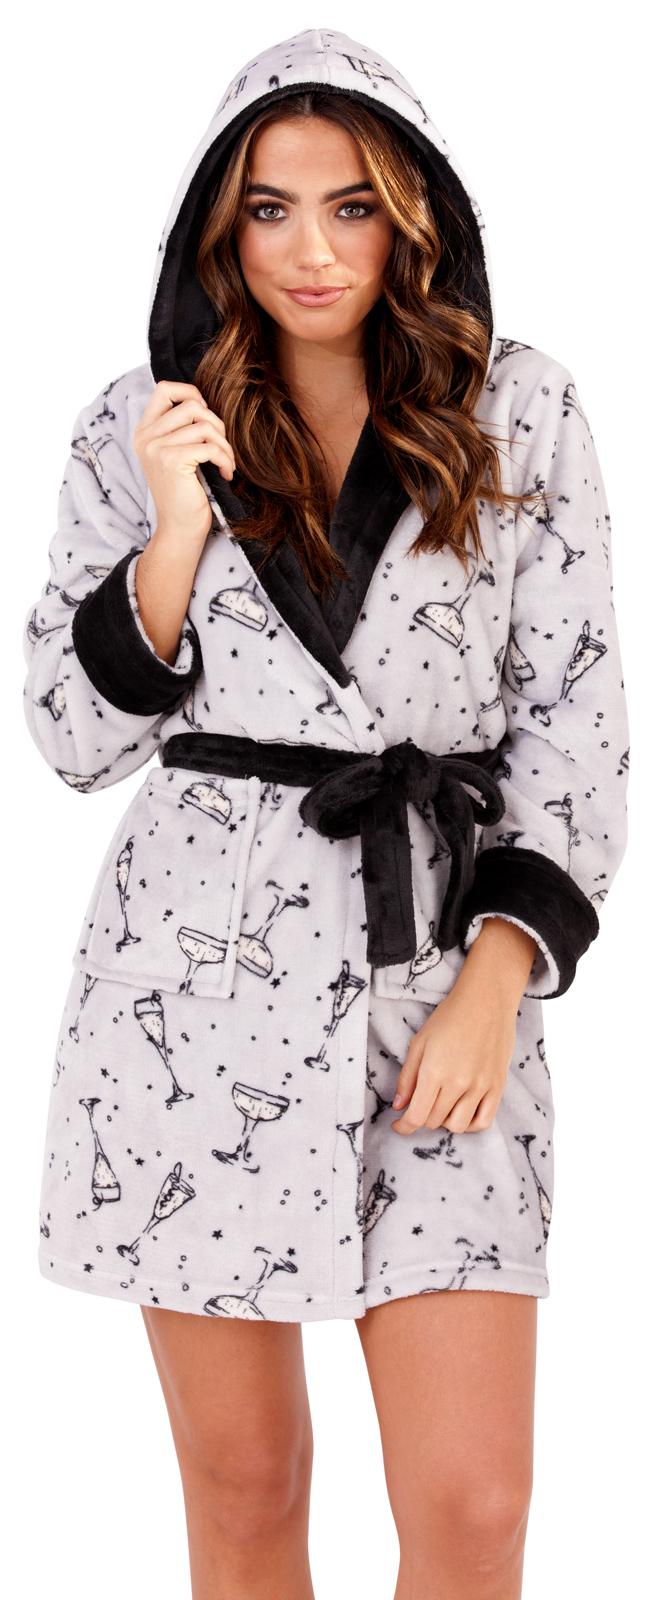 3bd78b574ba9 Womens Prosecco Short Hooded Robe Flannel Fleece Bathrobe Dressing ...